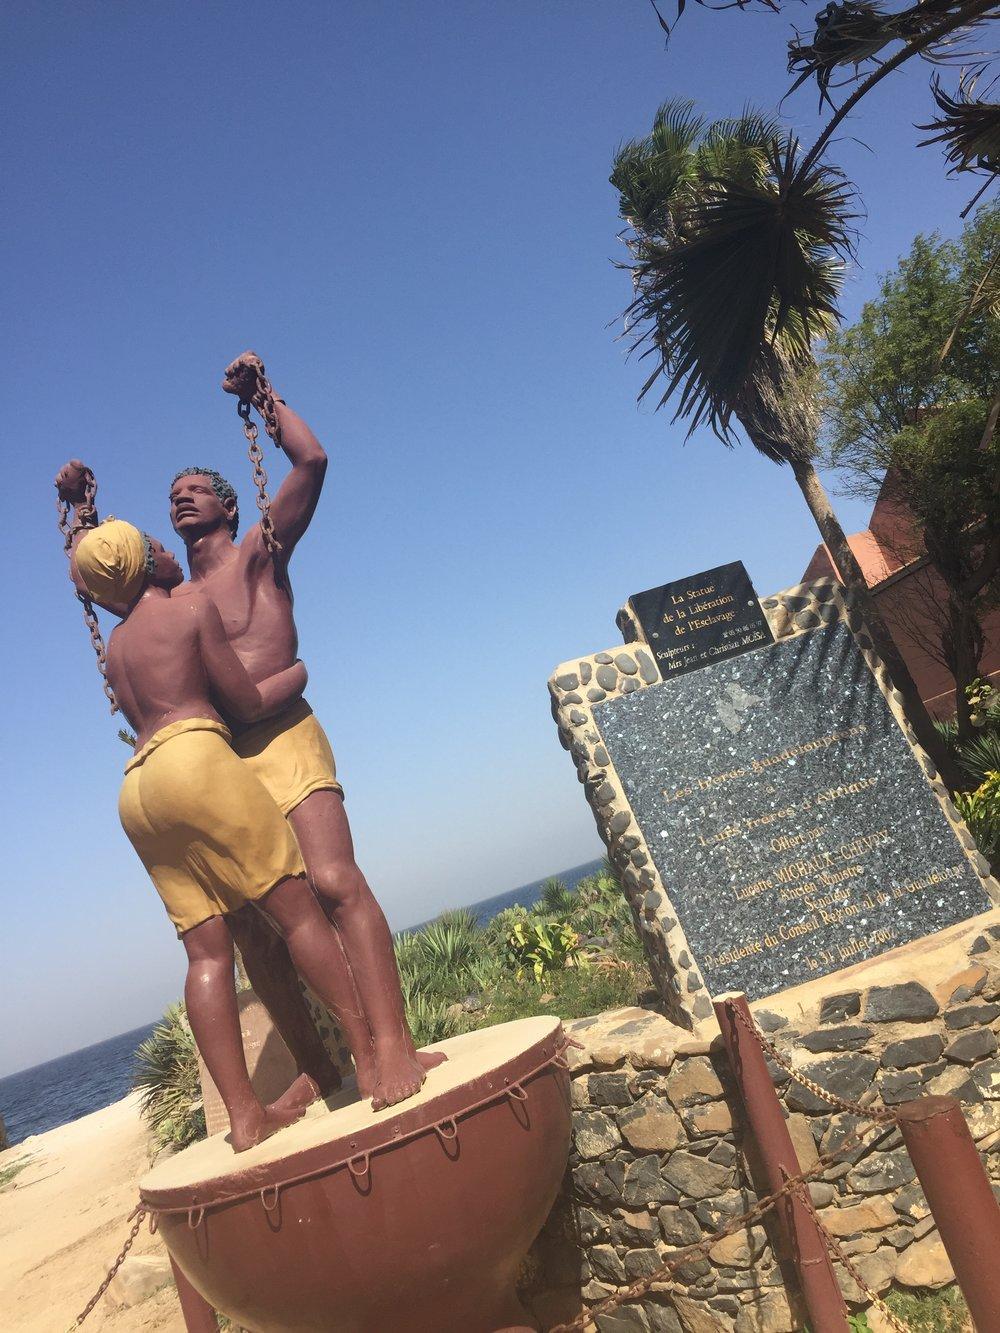 La Statue de la Libération de l'Esclavage